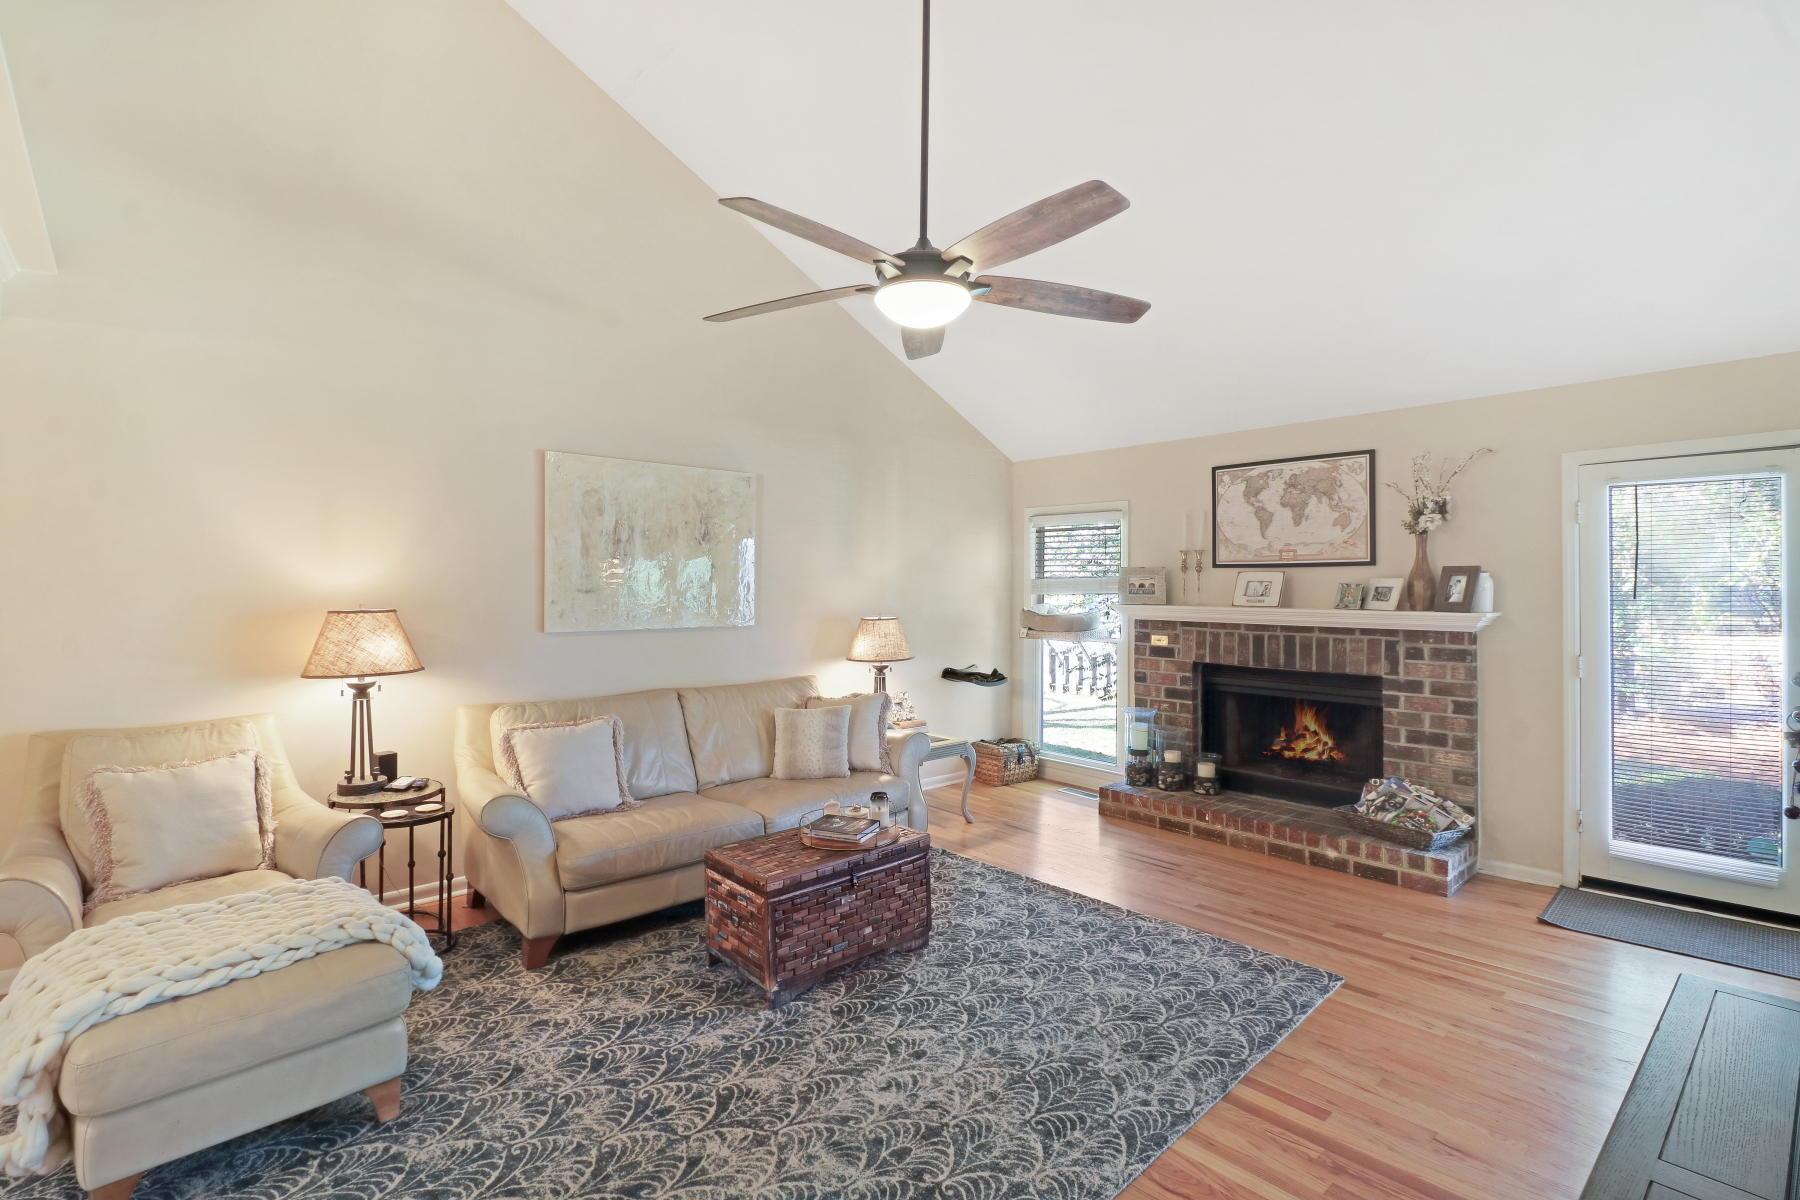 Harrison Acres Homes For Sale - 51 Markfield, Charleston, SC - 34